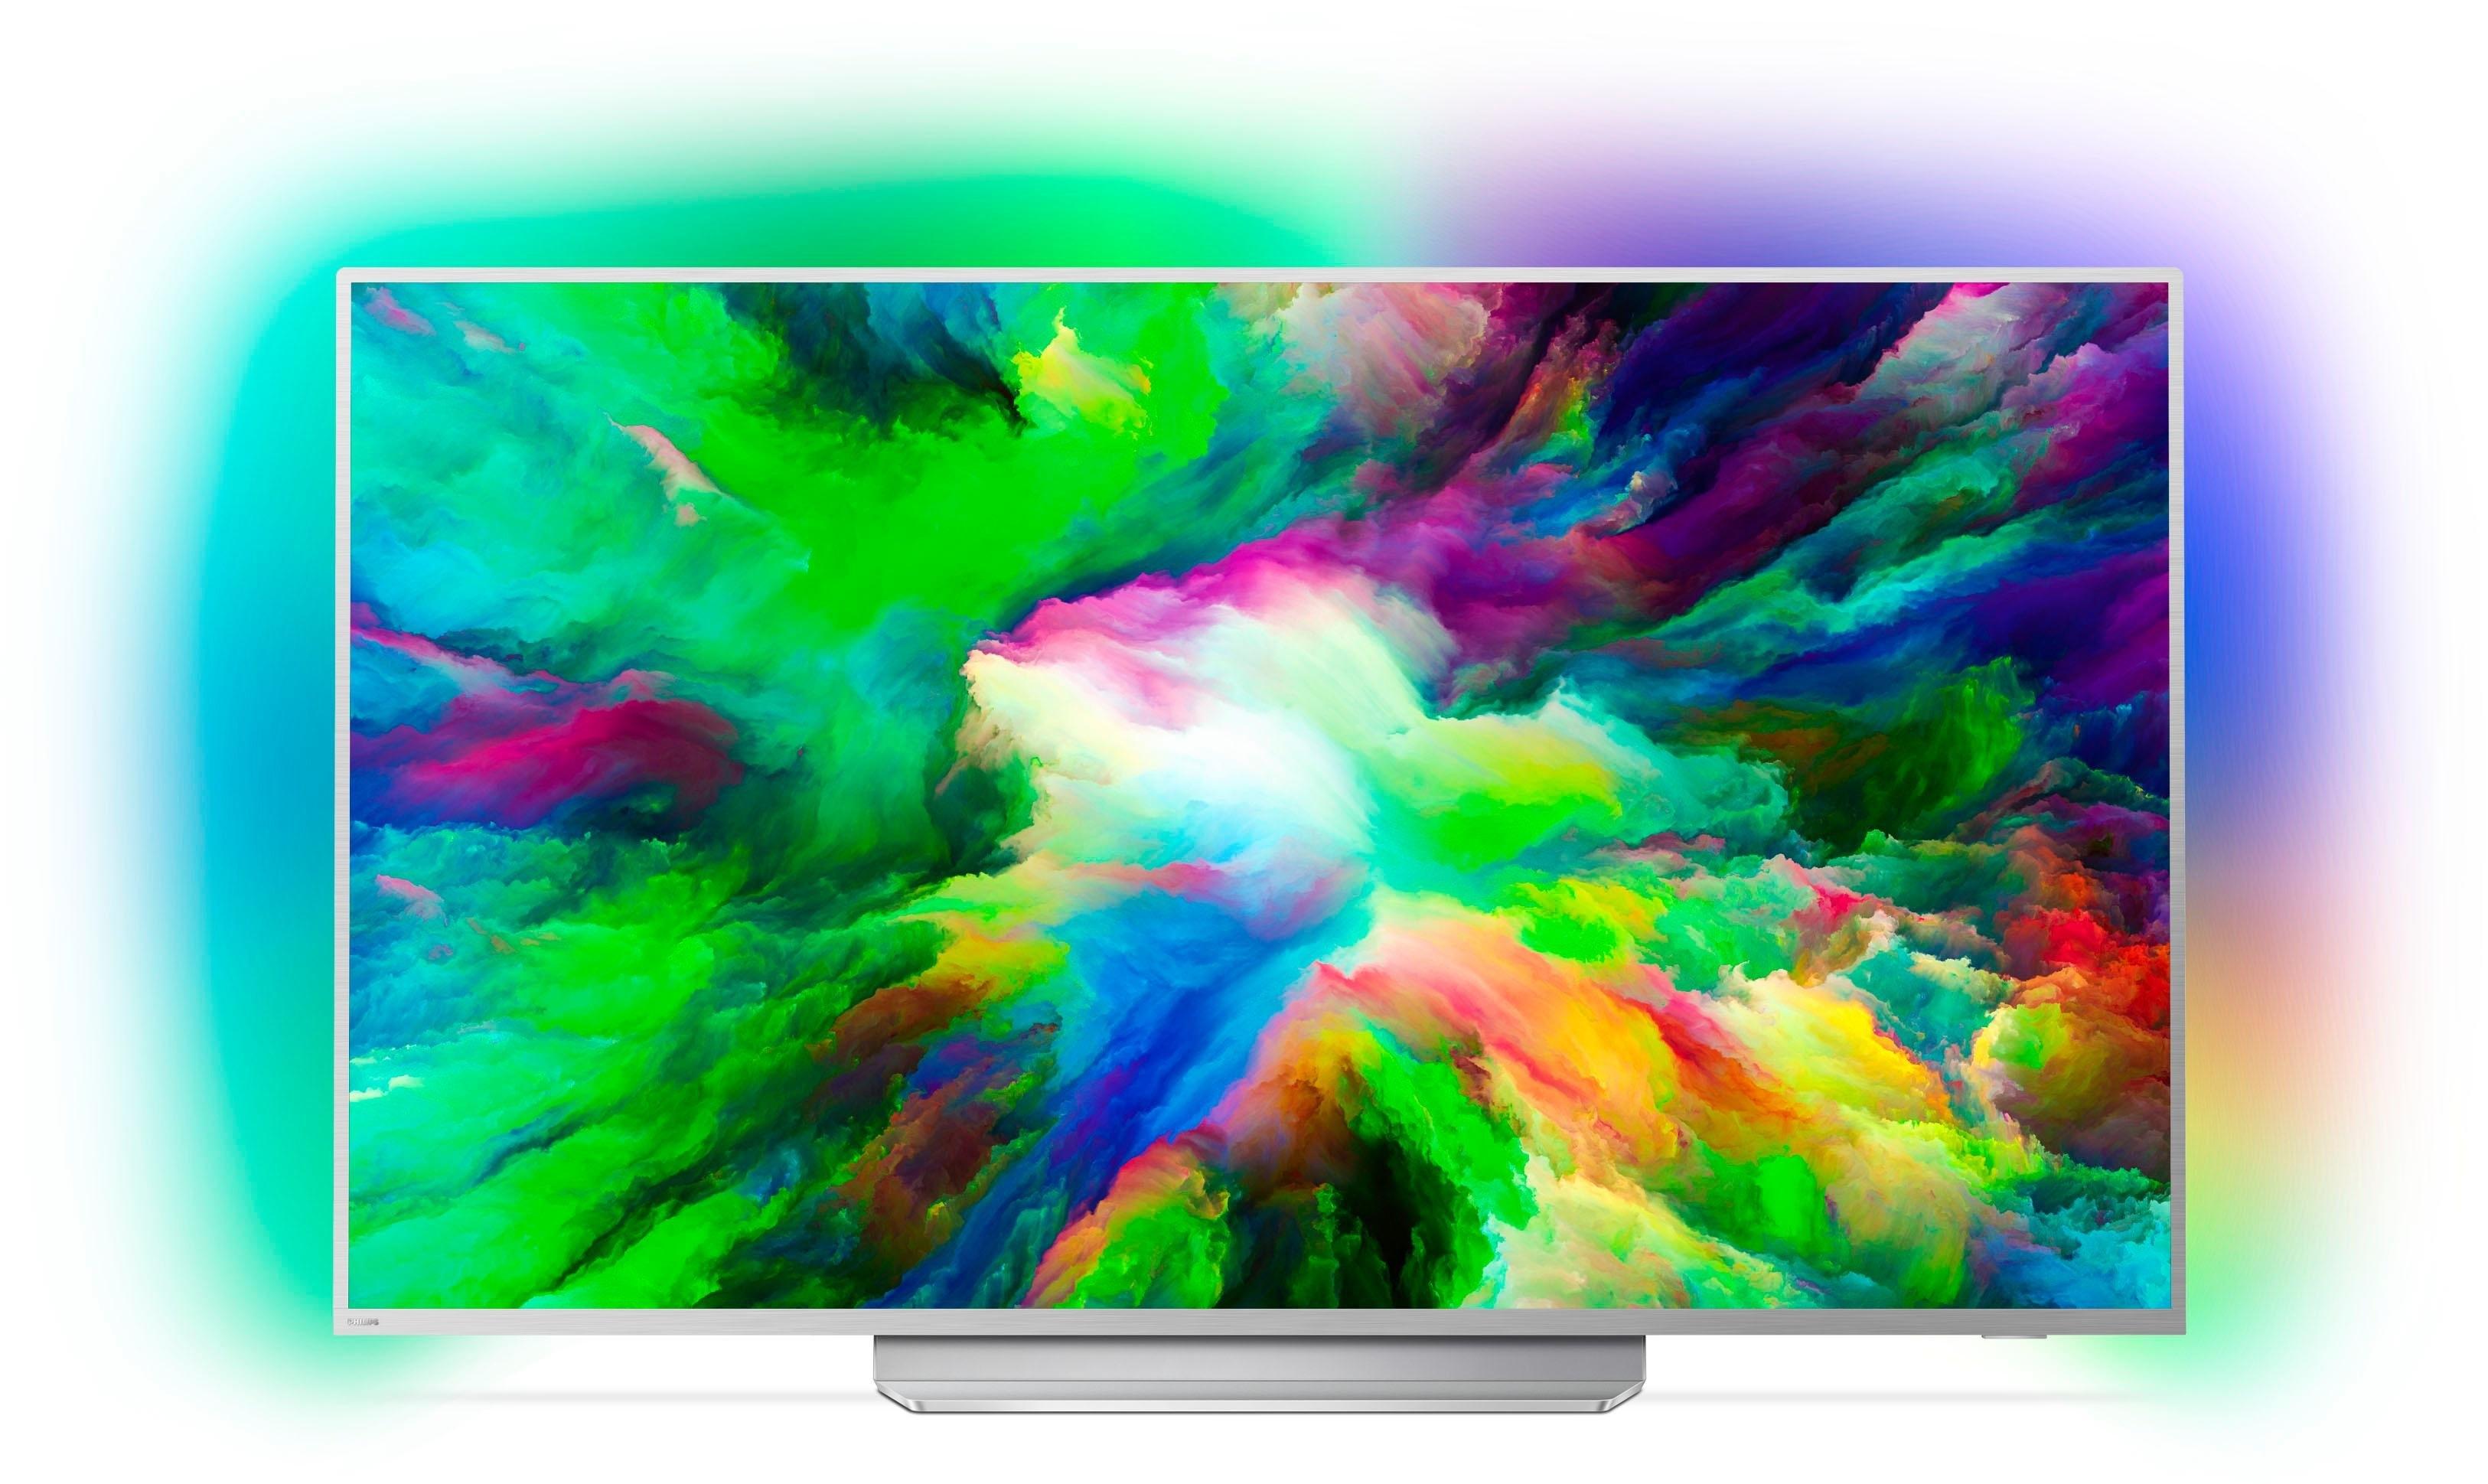 Philips 65PUS7803 led-tv (65 inch), 4K Ultra HD, smart-tv goedkoop op otto.nl kopen